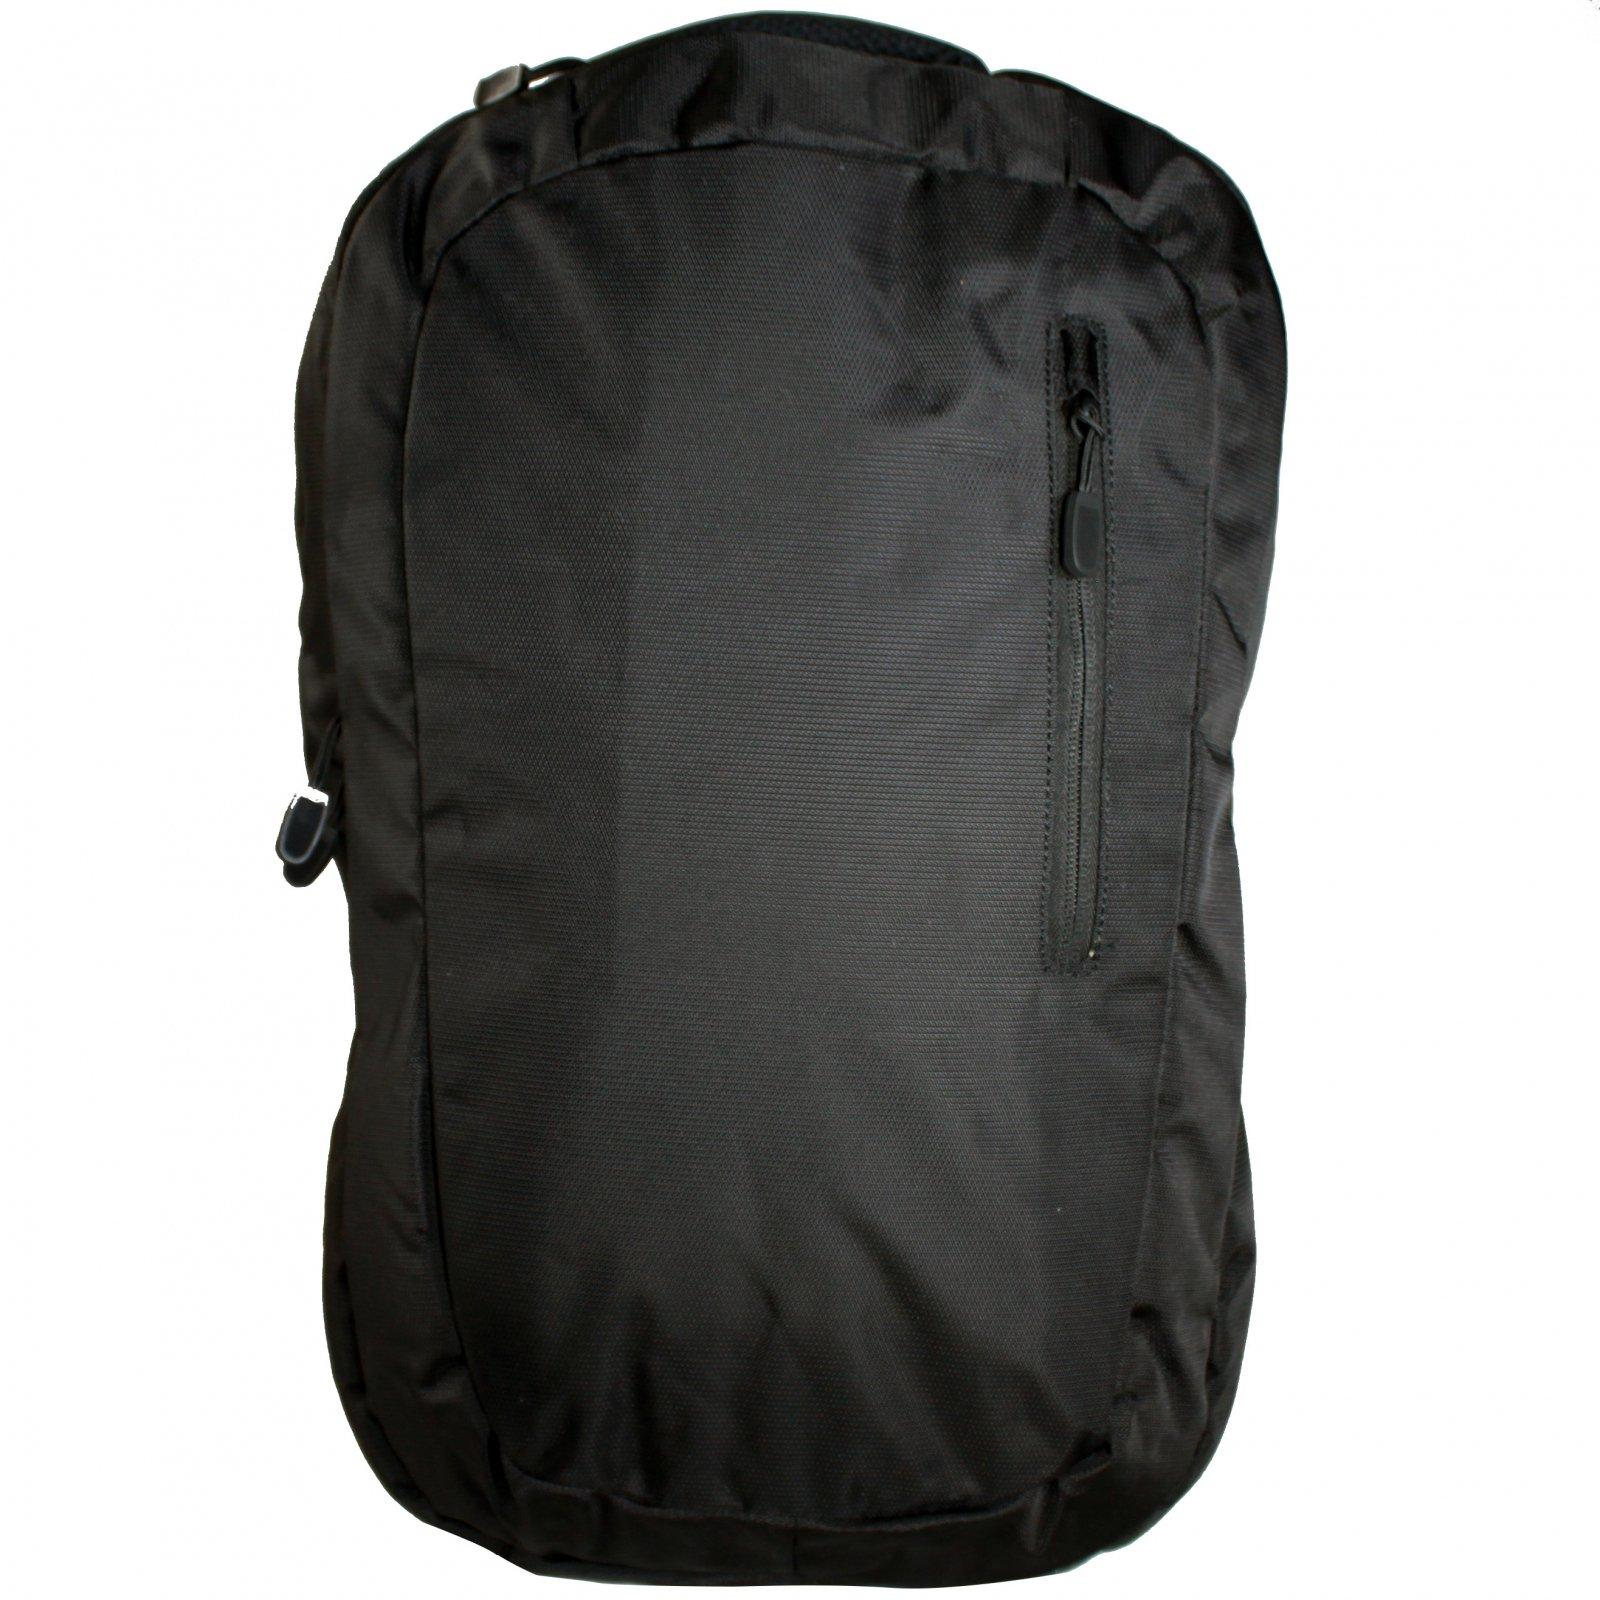 ASR Outdoor 20L High Capacity Laptop Backpack Black